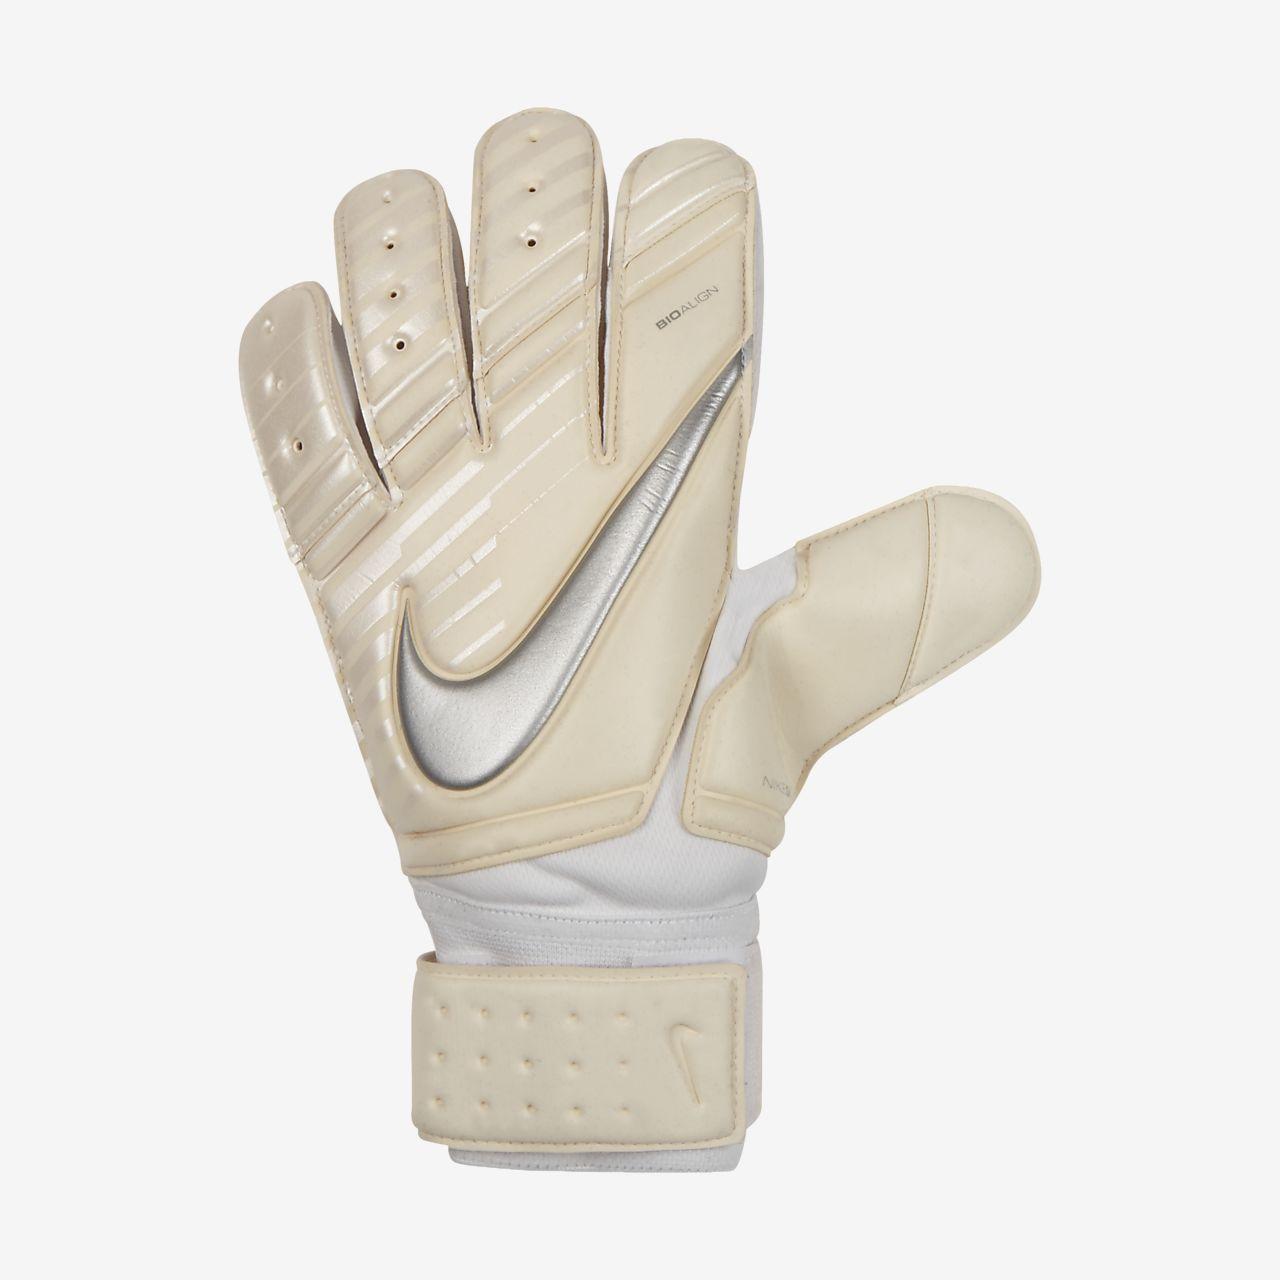 Nike Premier Grip3 Goalkeeper Fußballhandschuhe